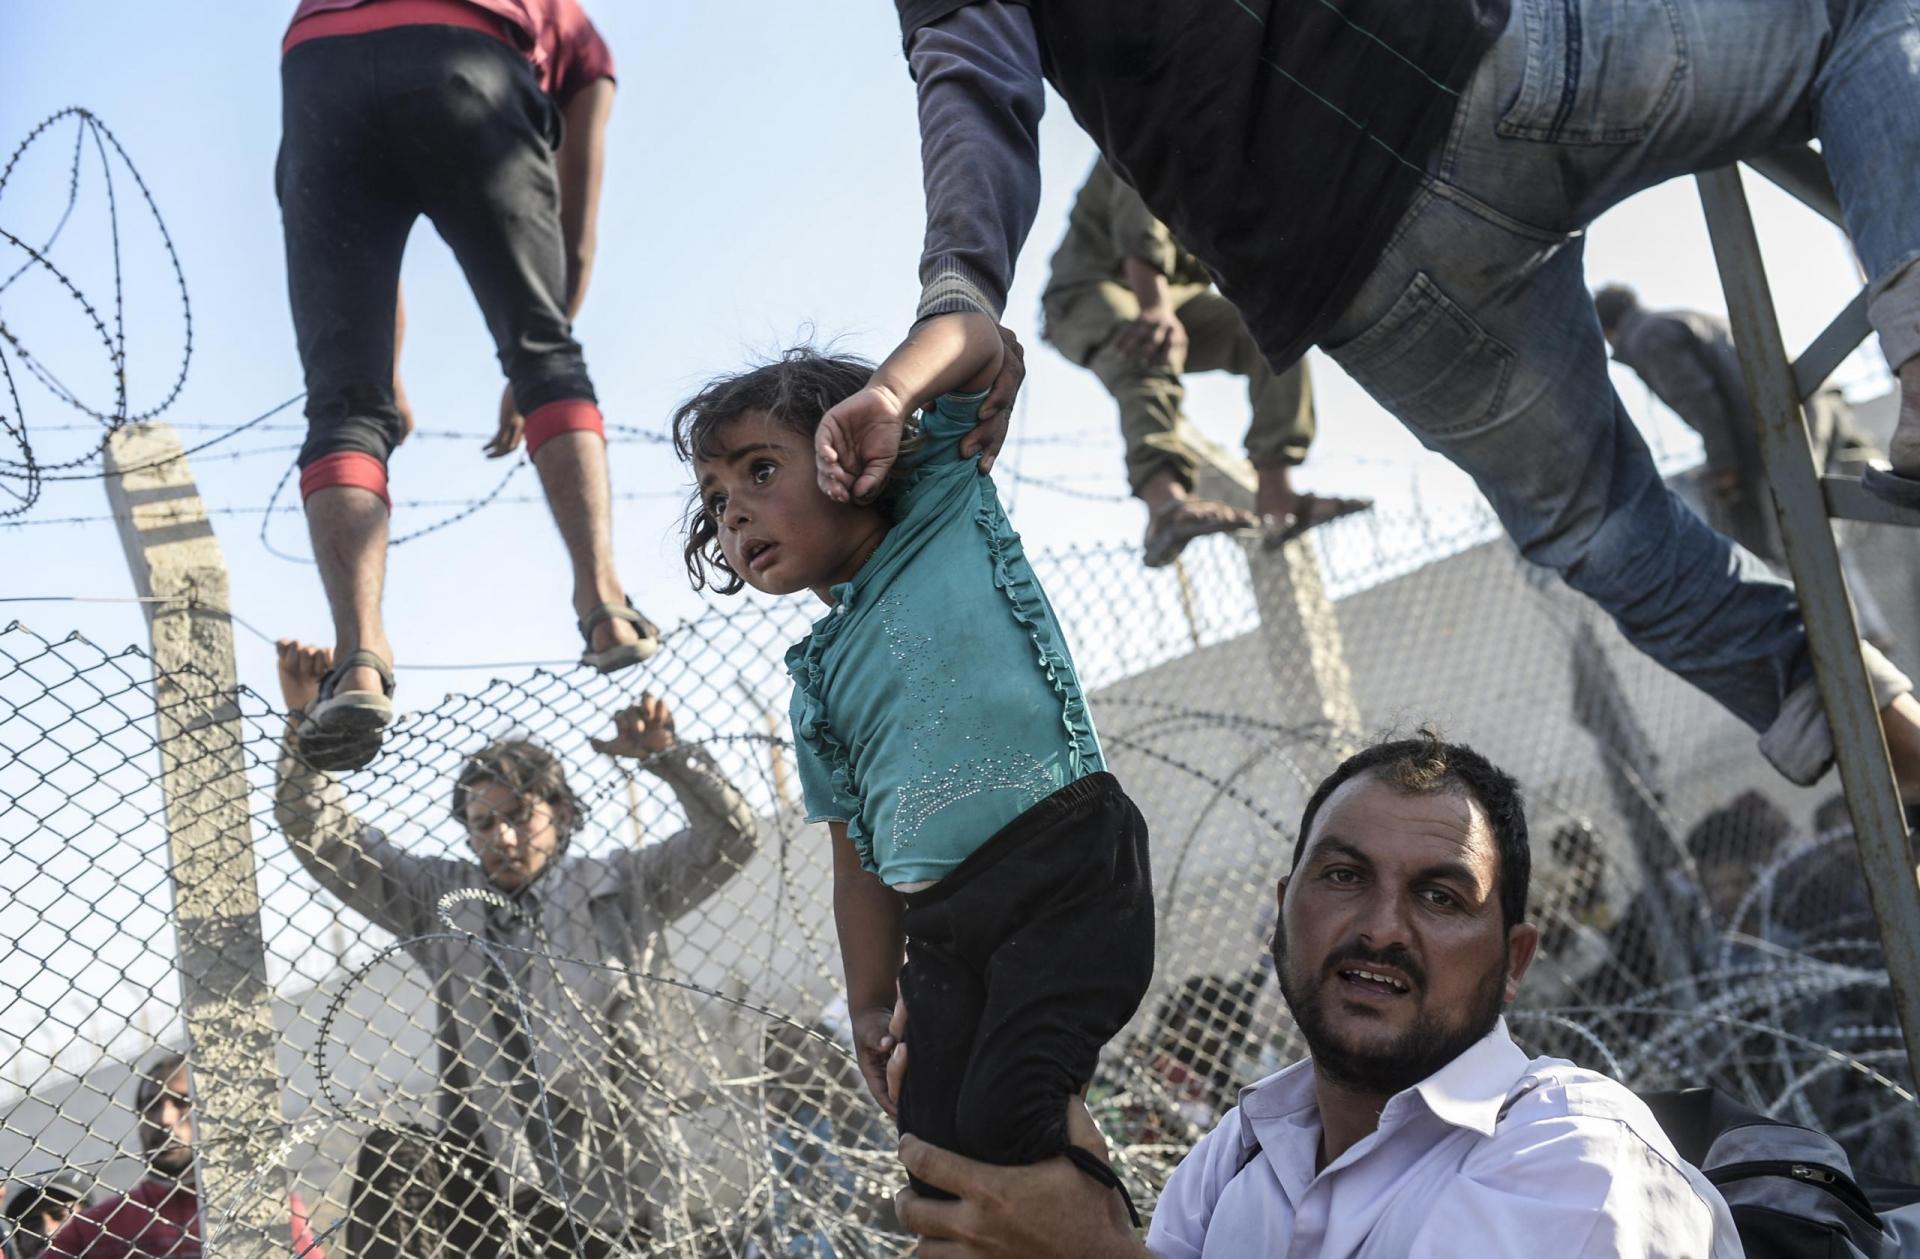 Fotografie in migrazione